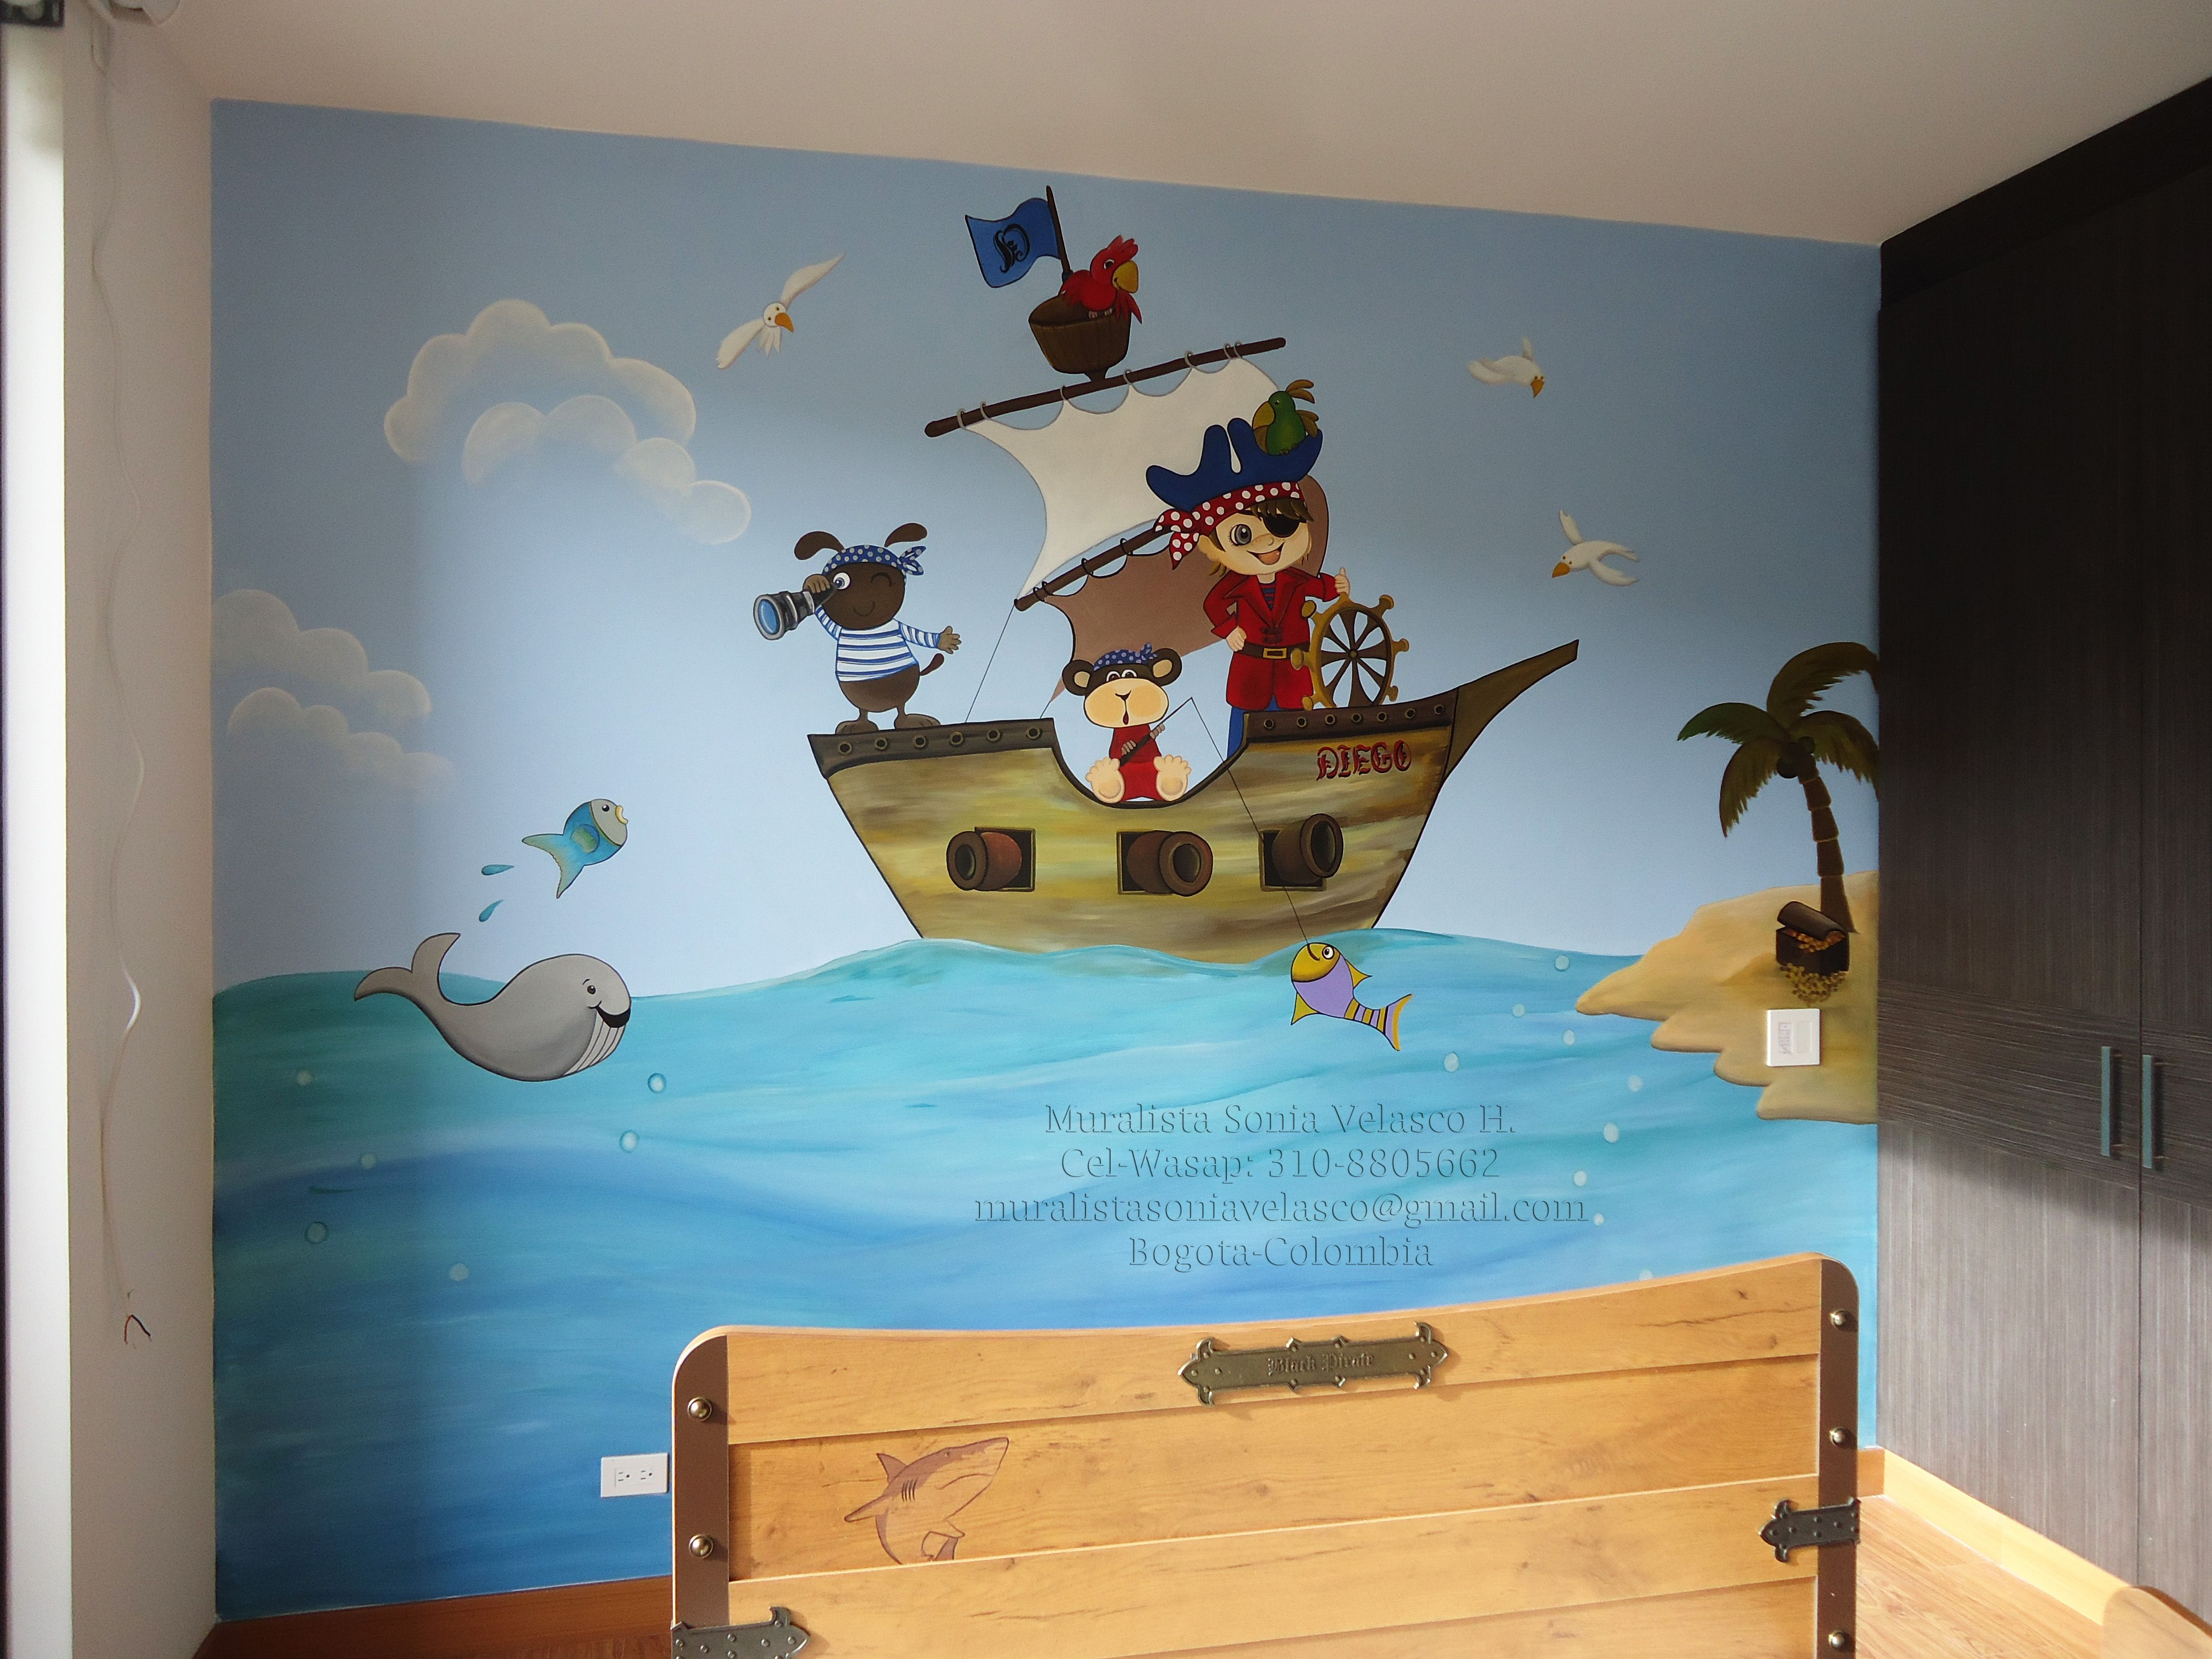 Muralista Sonia Velasco Cel Washapp 310 8805662 Correo  # Muebles Jennifer'S Bogota